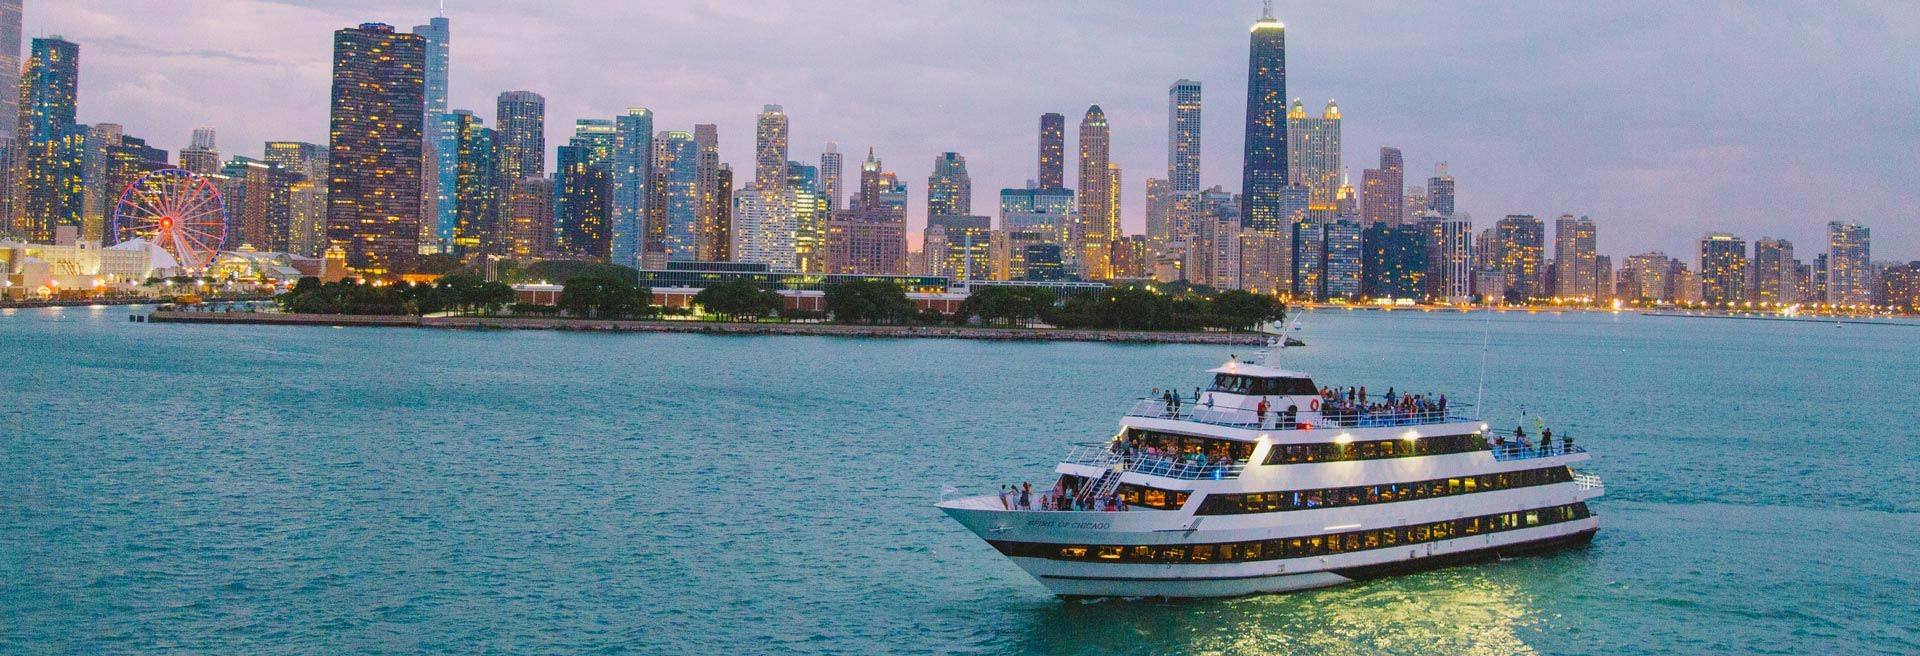 Chicago Dinner Cruise  Chicago Lunch & Dinner Cruises & Skyline Views